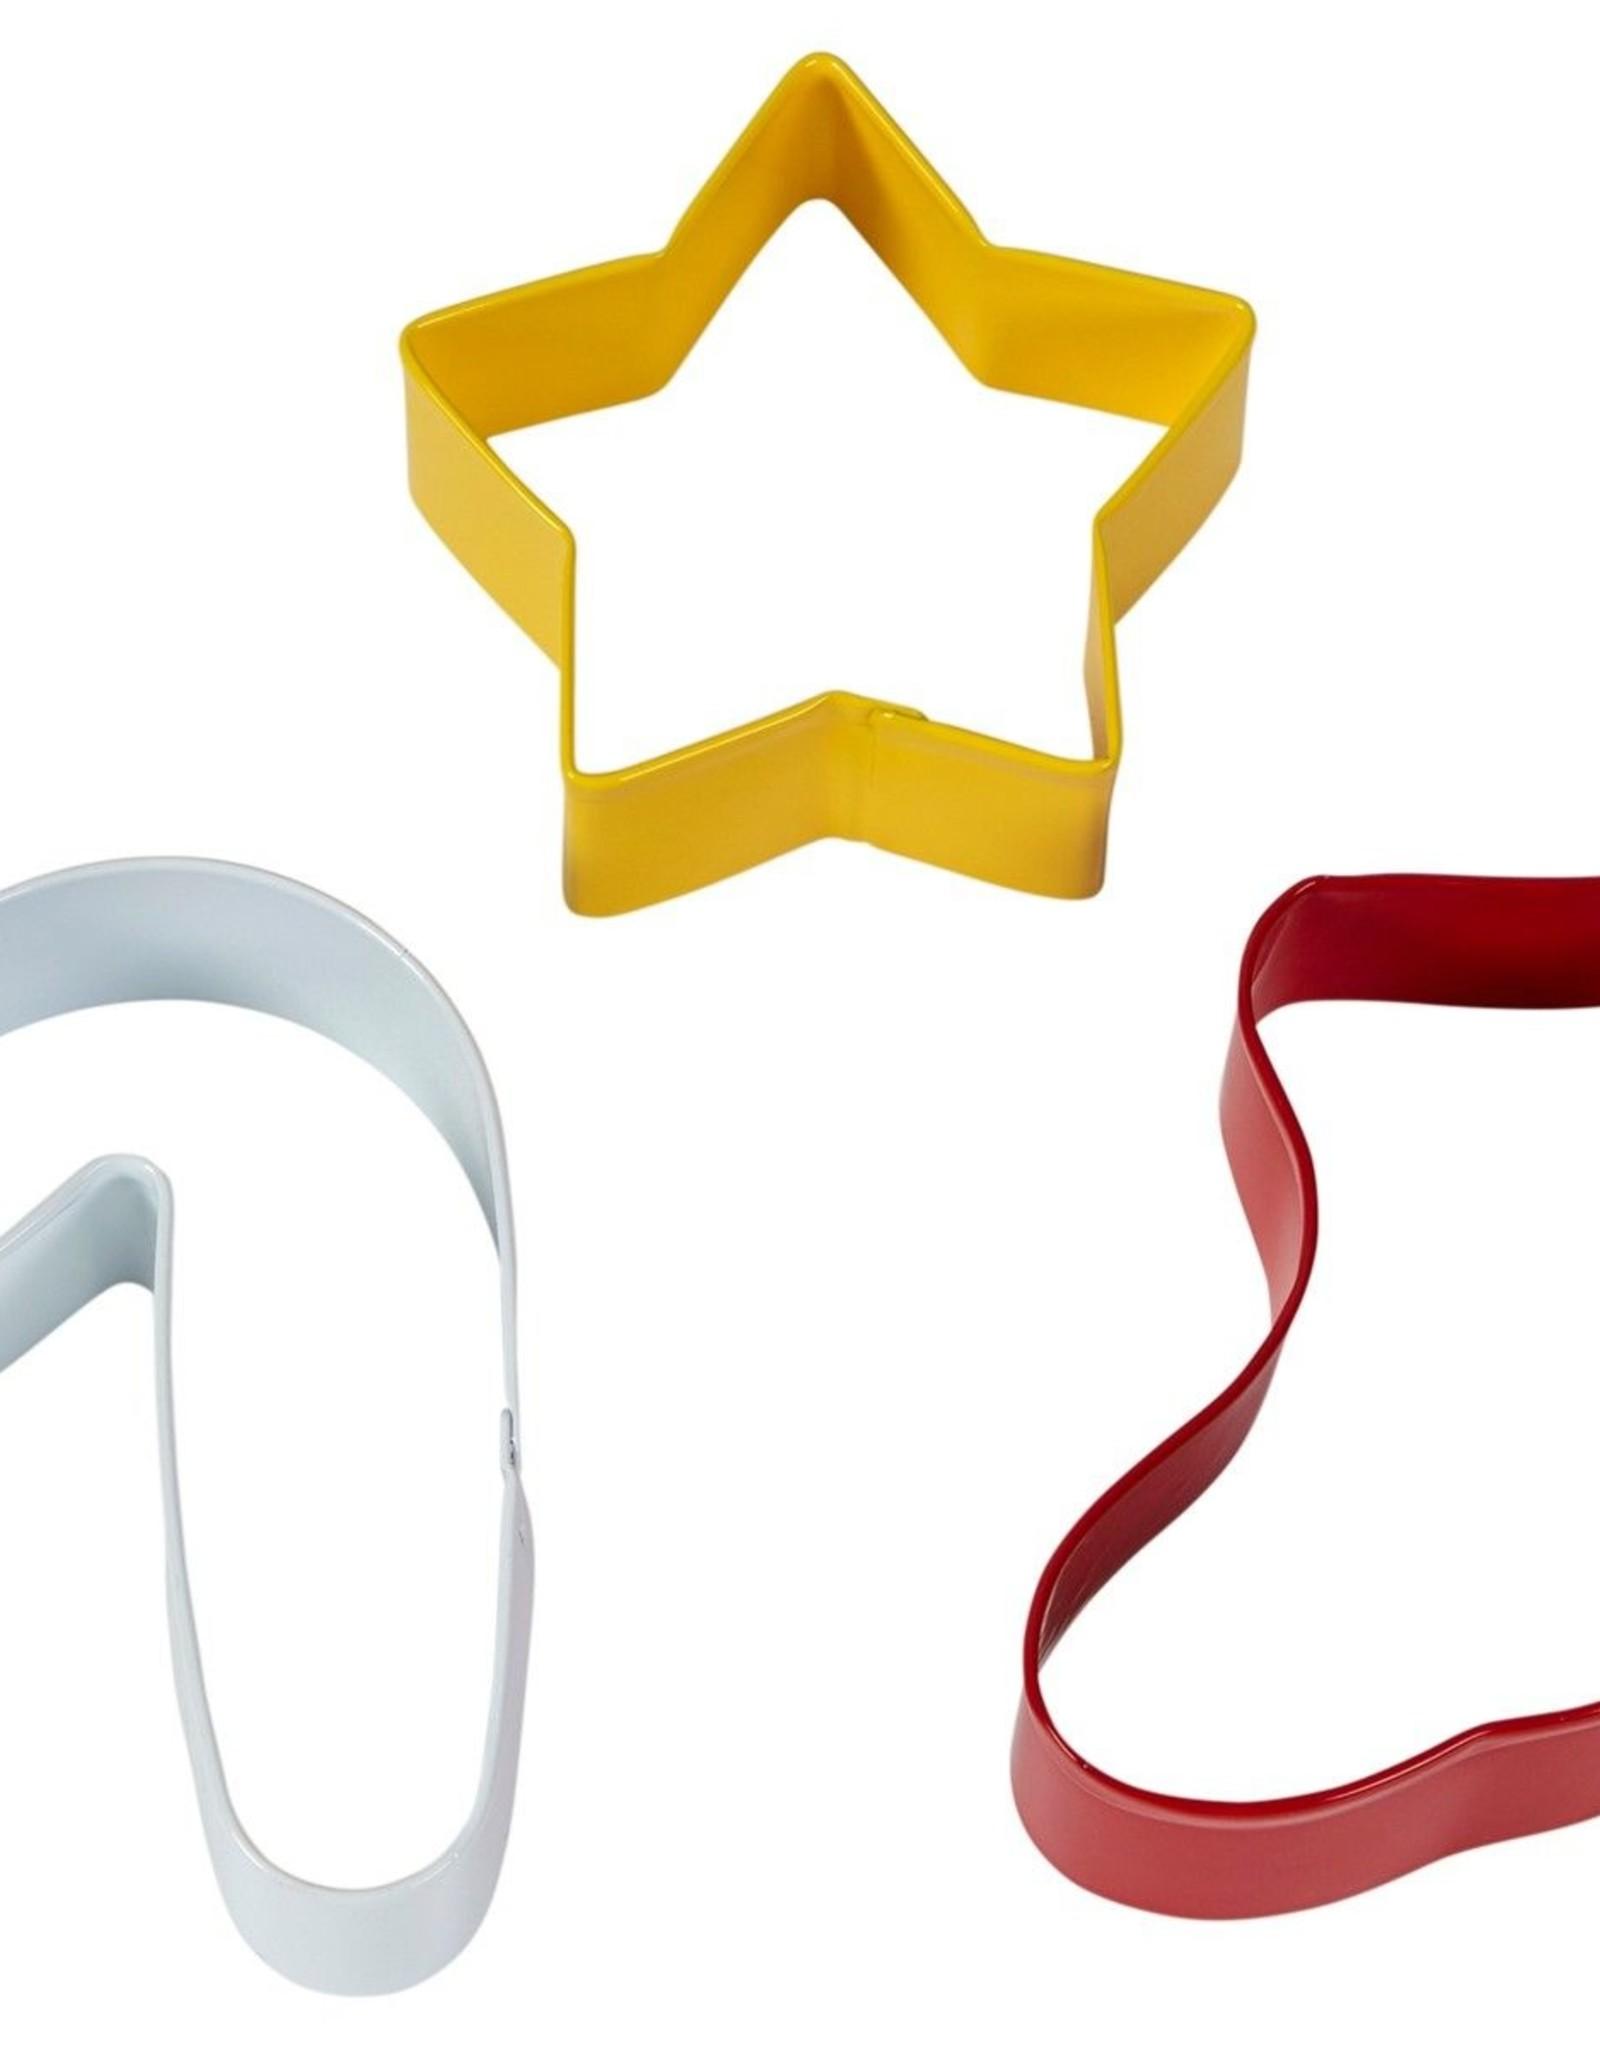 Wilton Uitsteker ster, sok, zuurstok - Set van 3